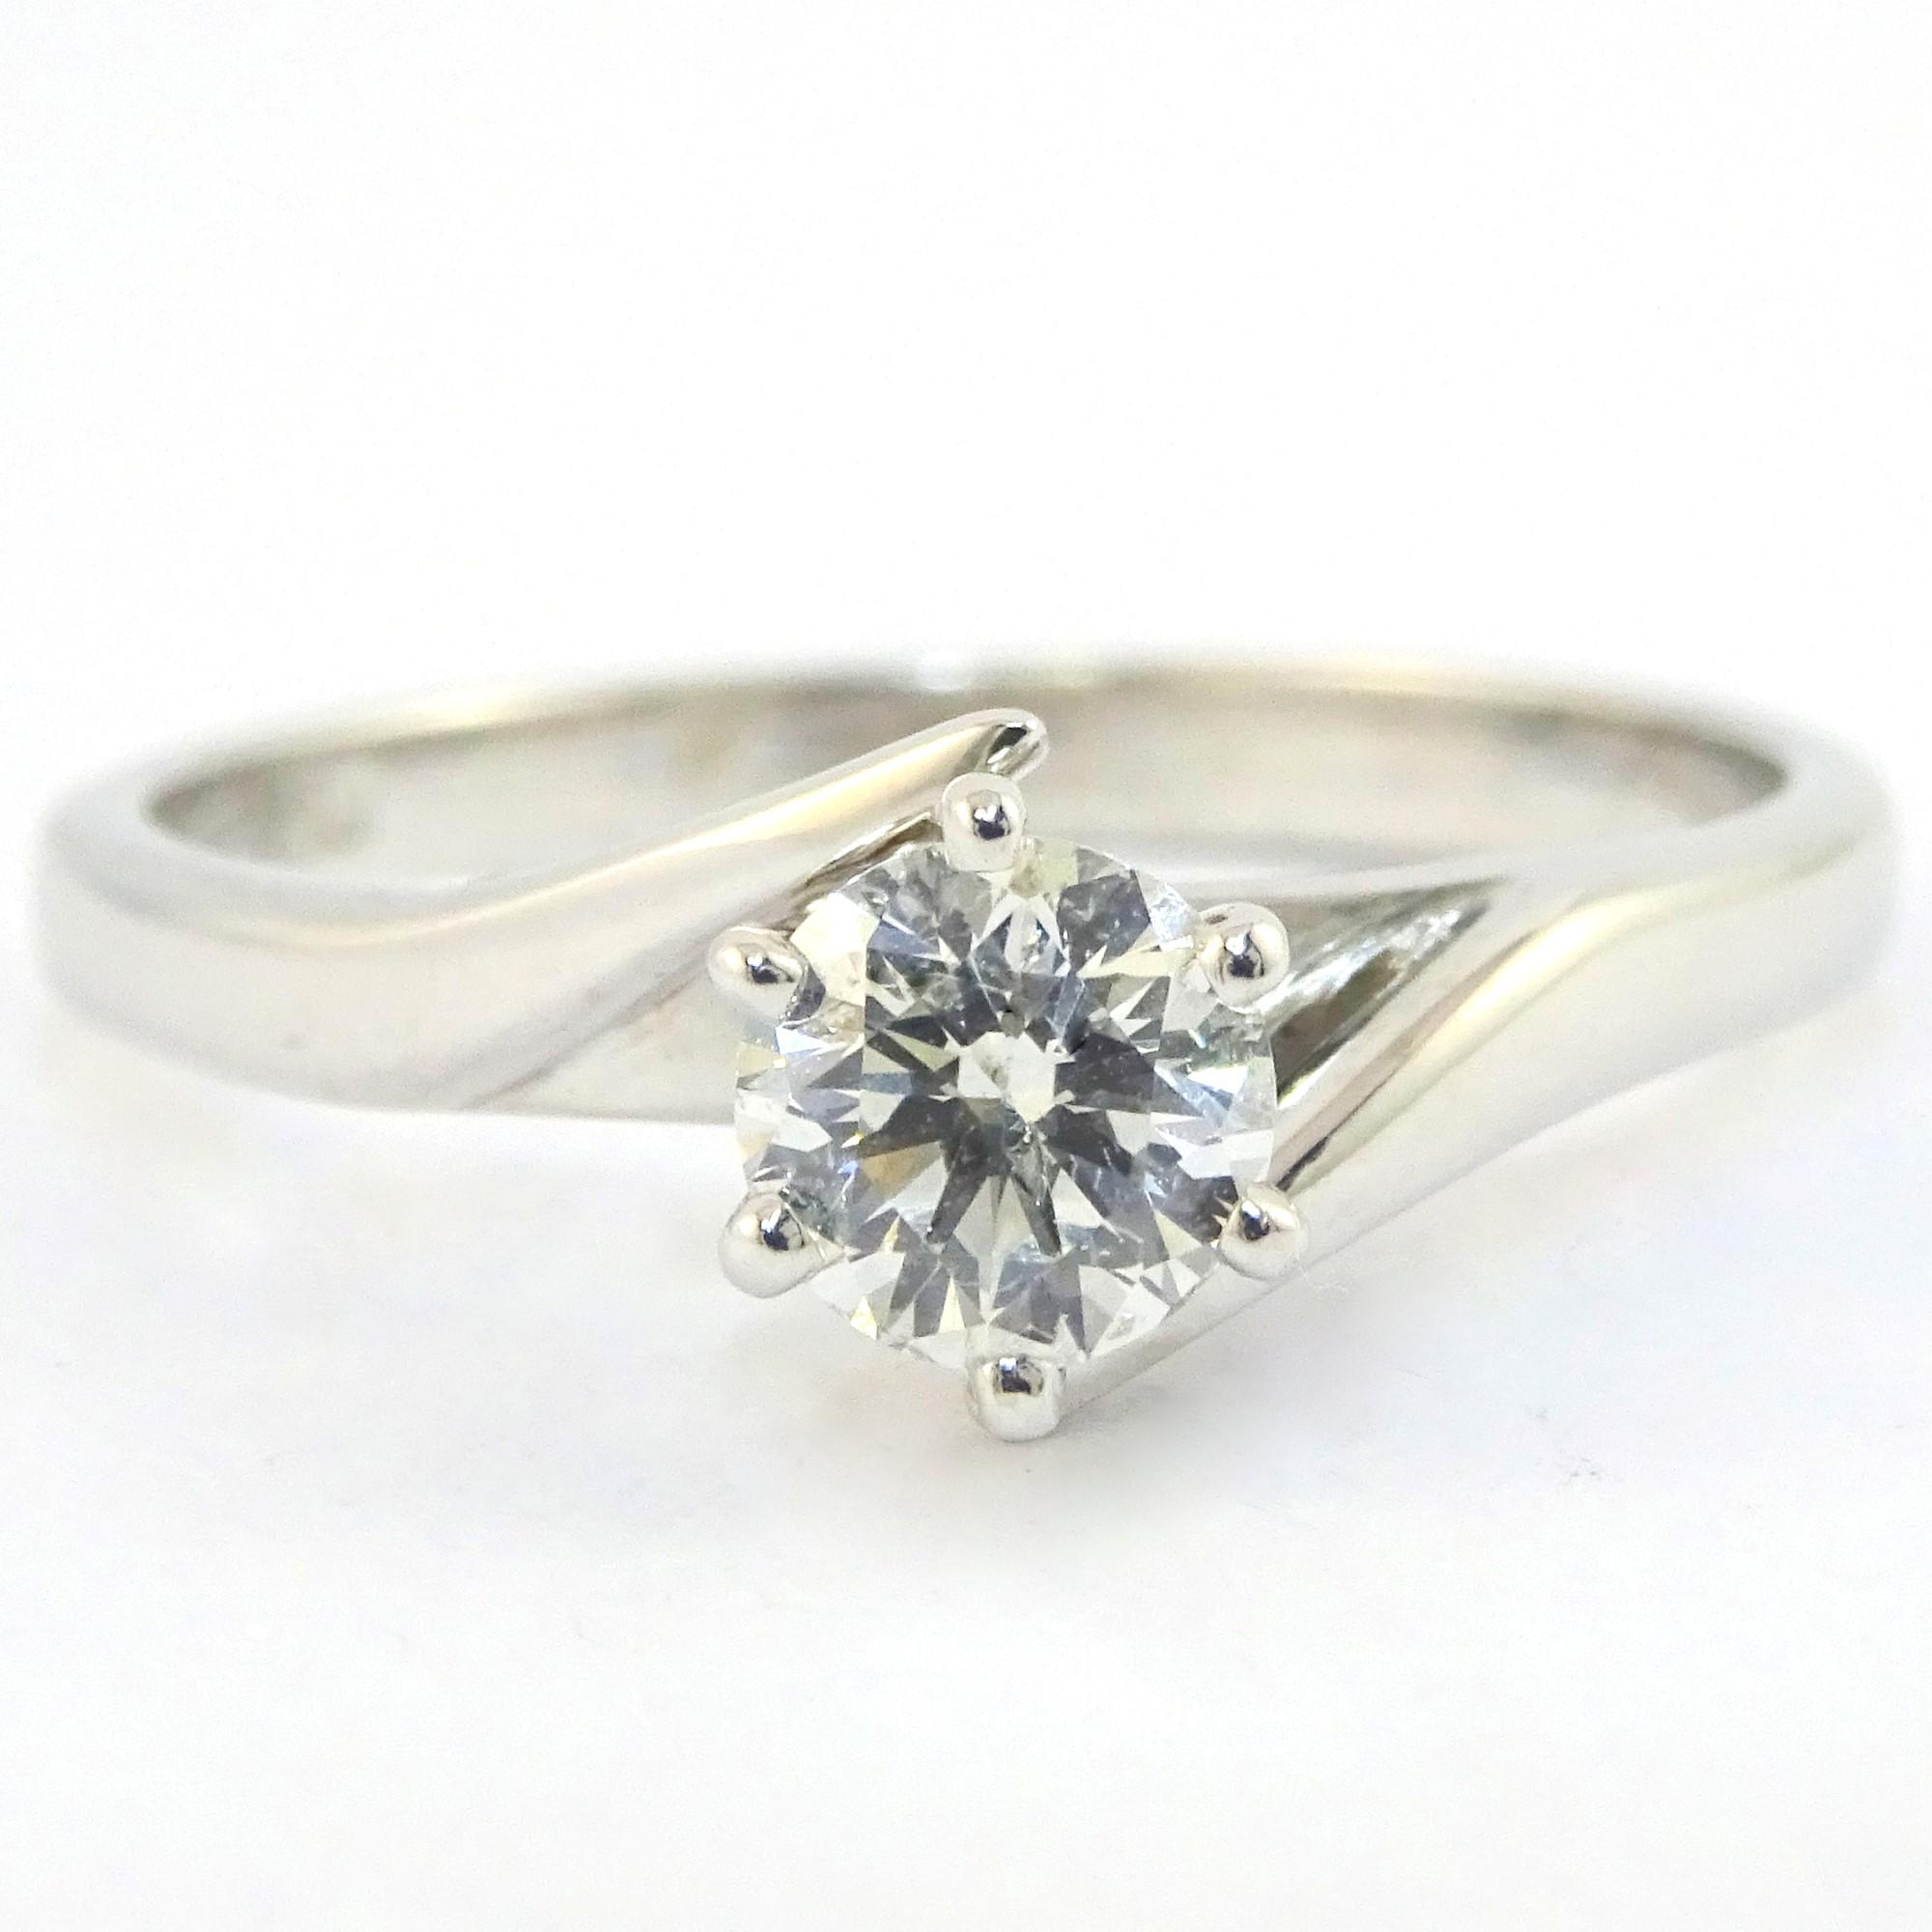 18Ct 3.13G 18ct White Gold Ladies Diamond Ring With Stone